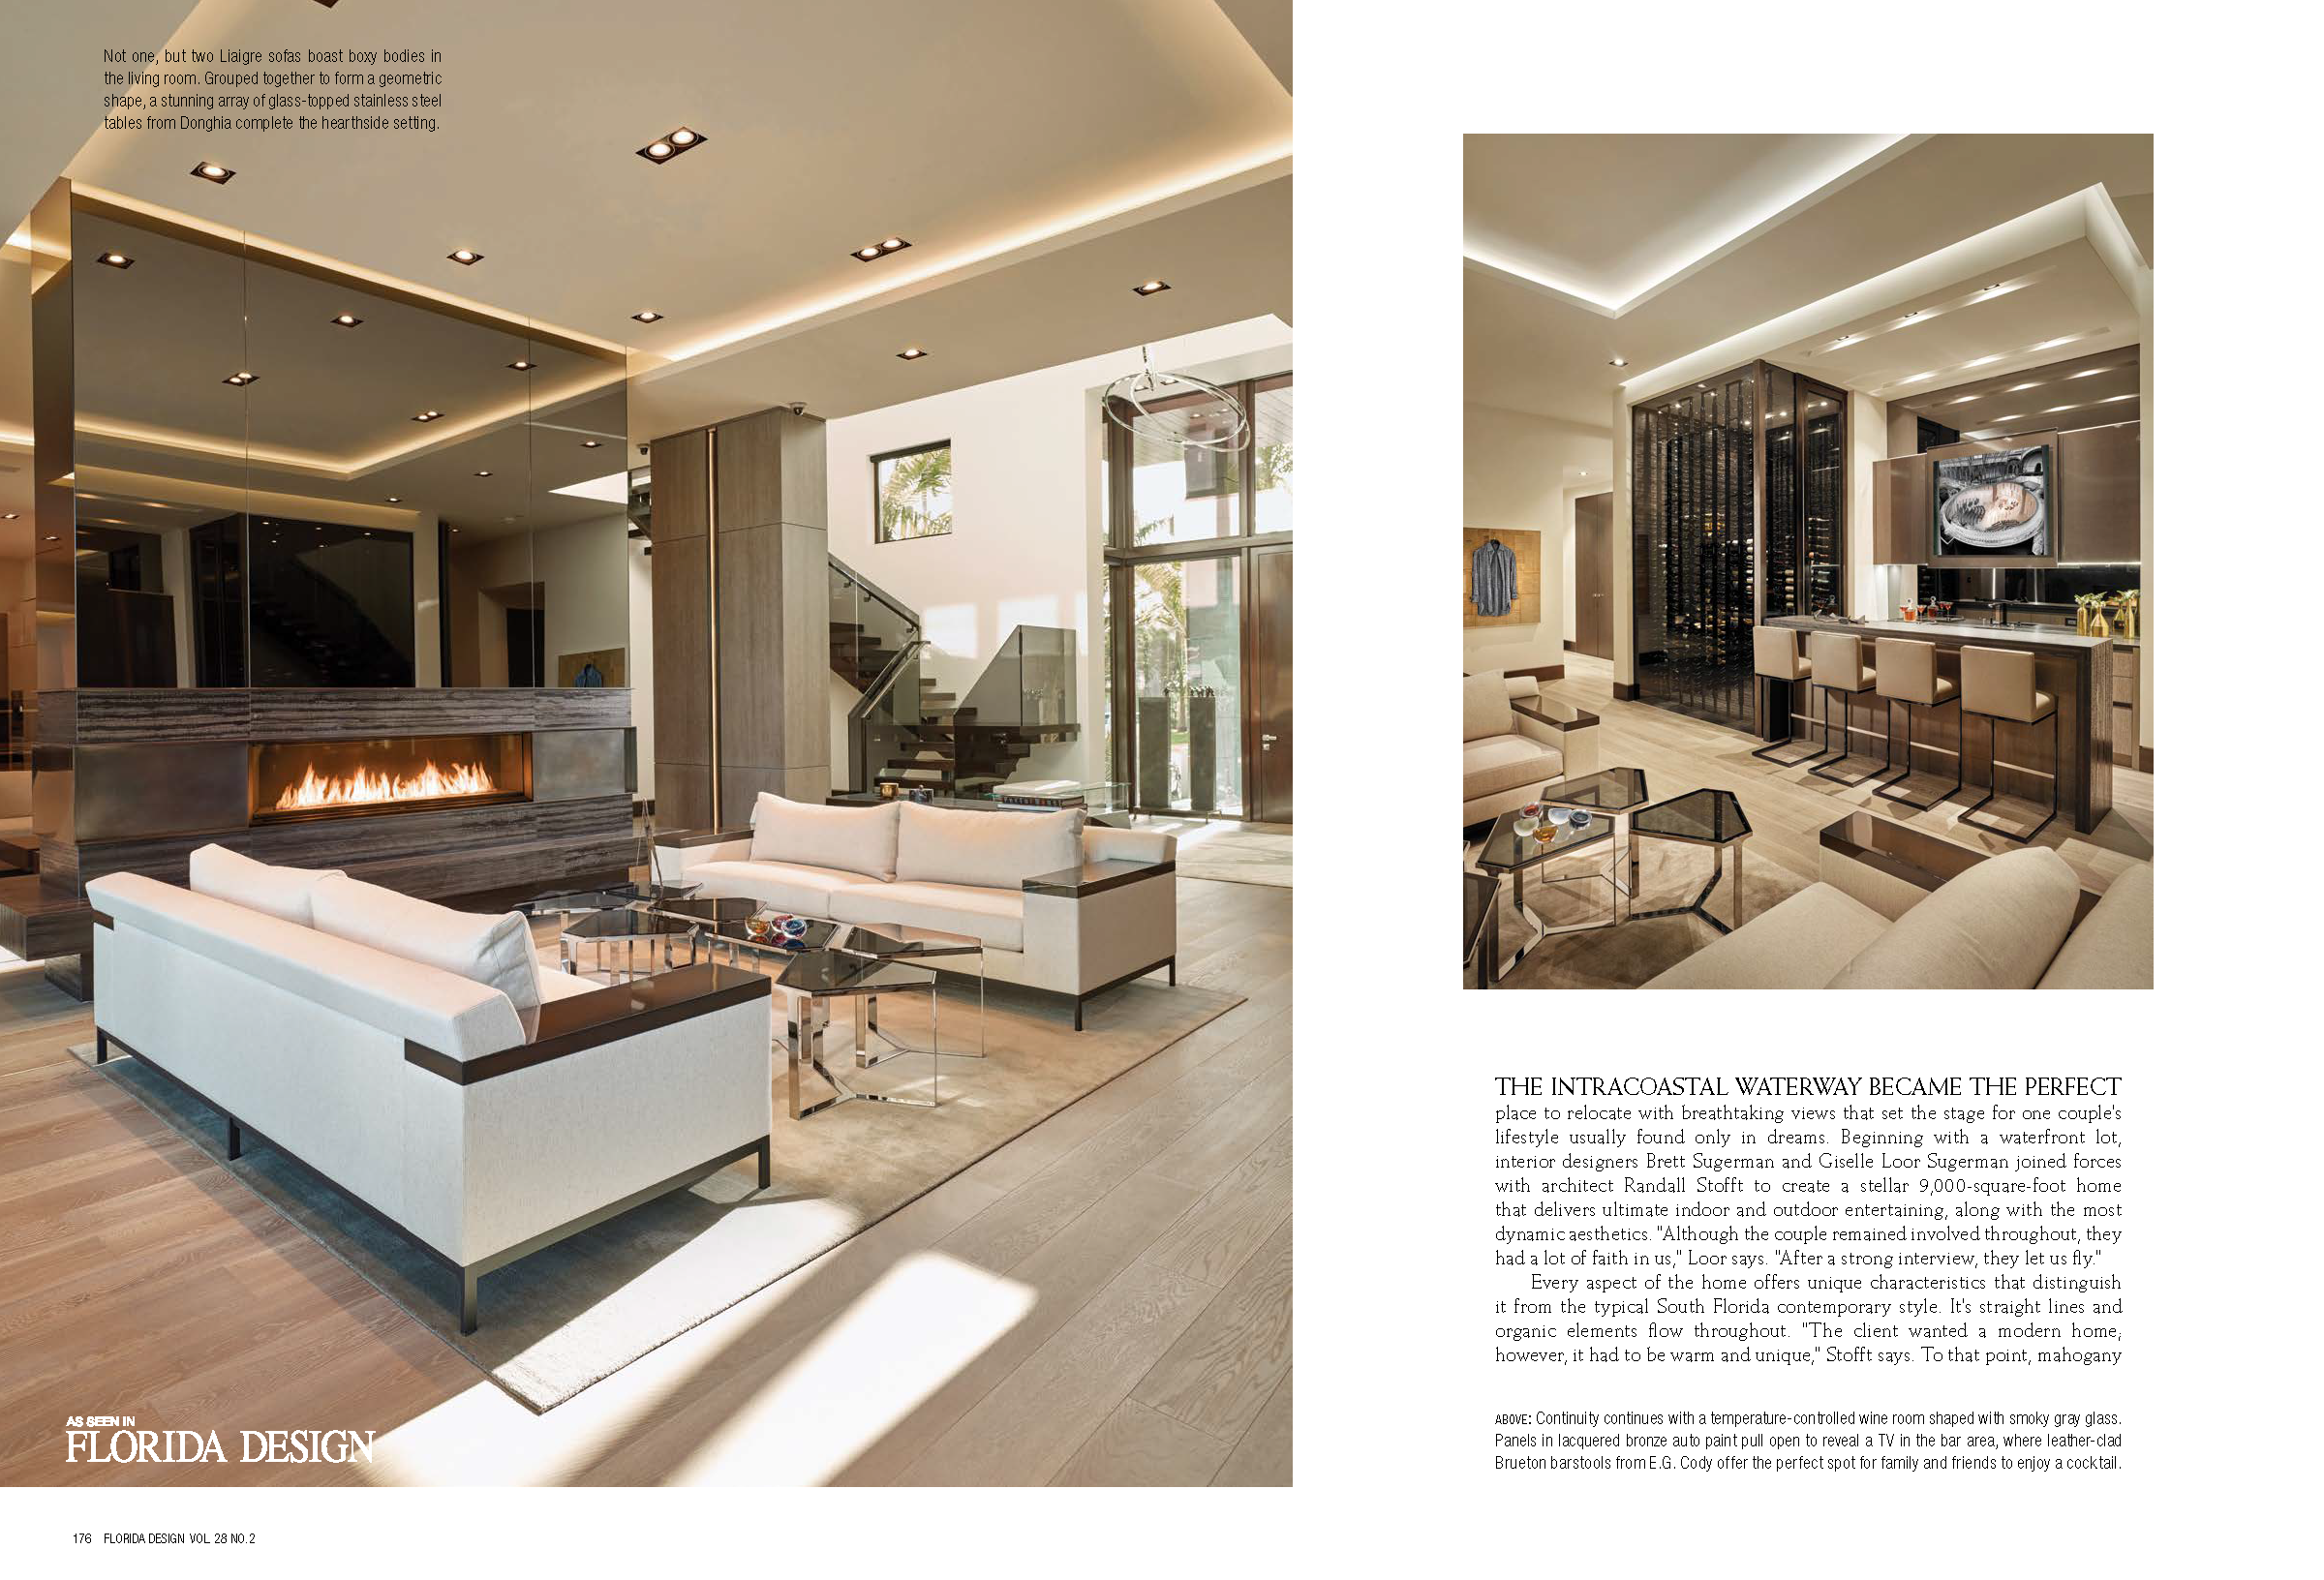 B&G-Design_Berman_FD281_as-seen-in_Page_2.png